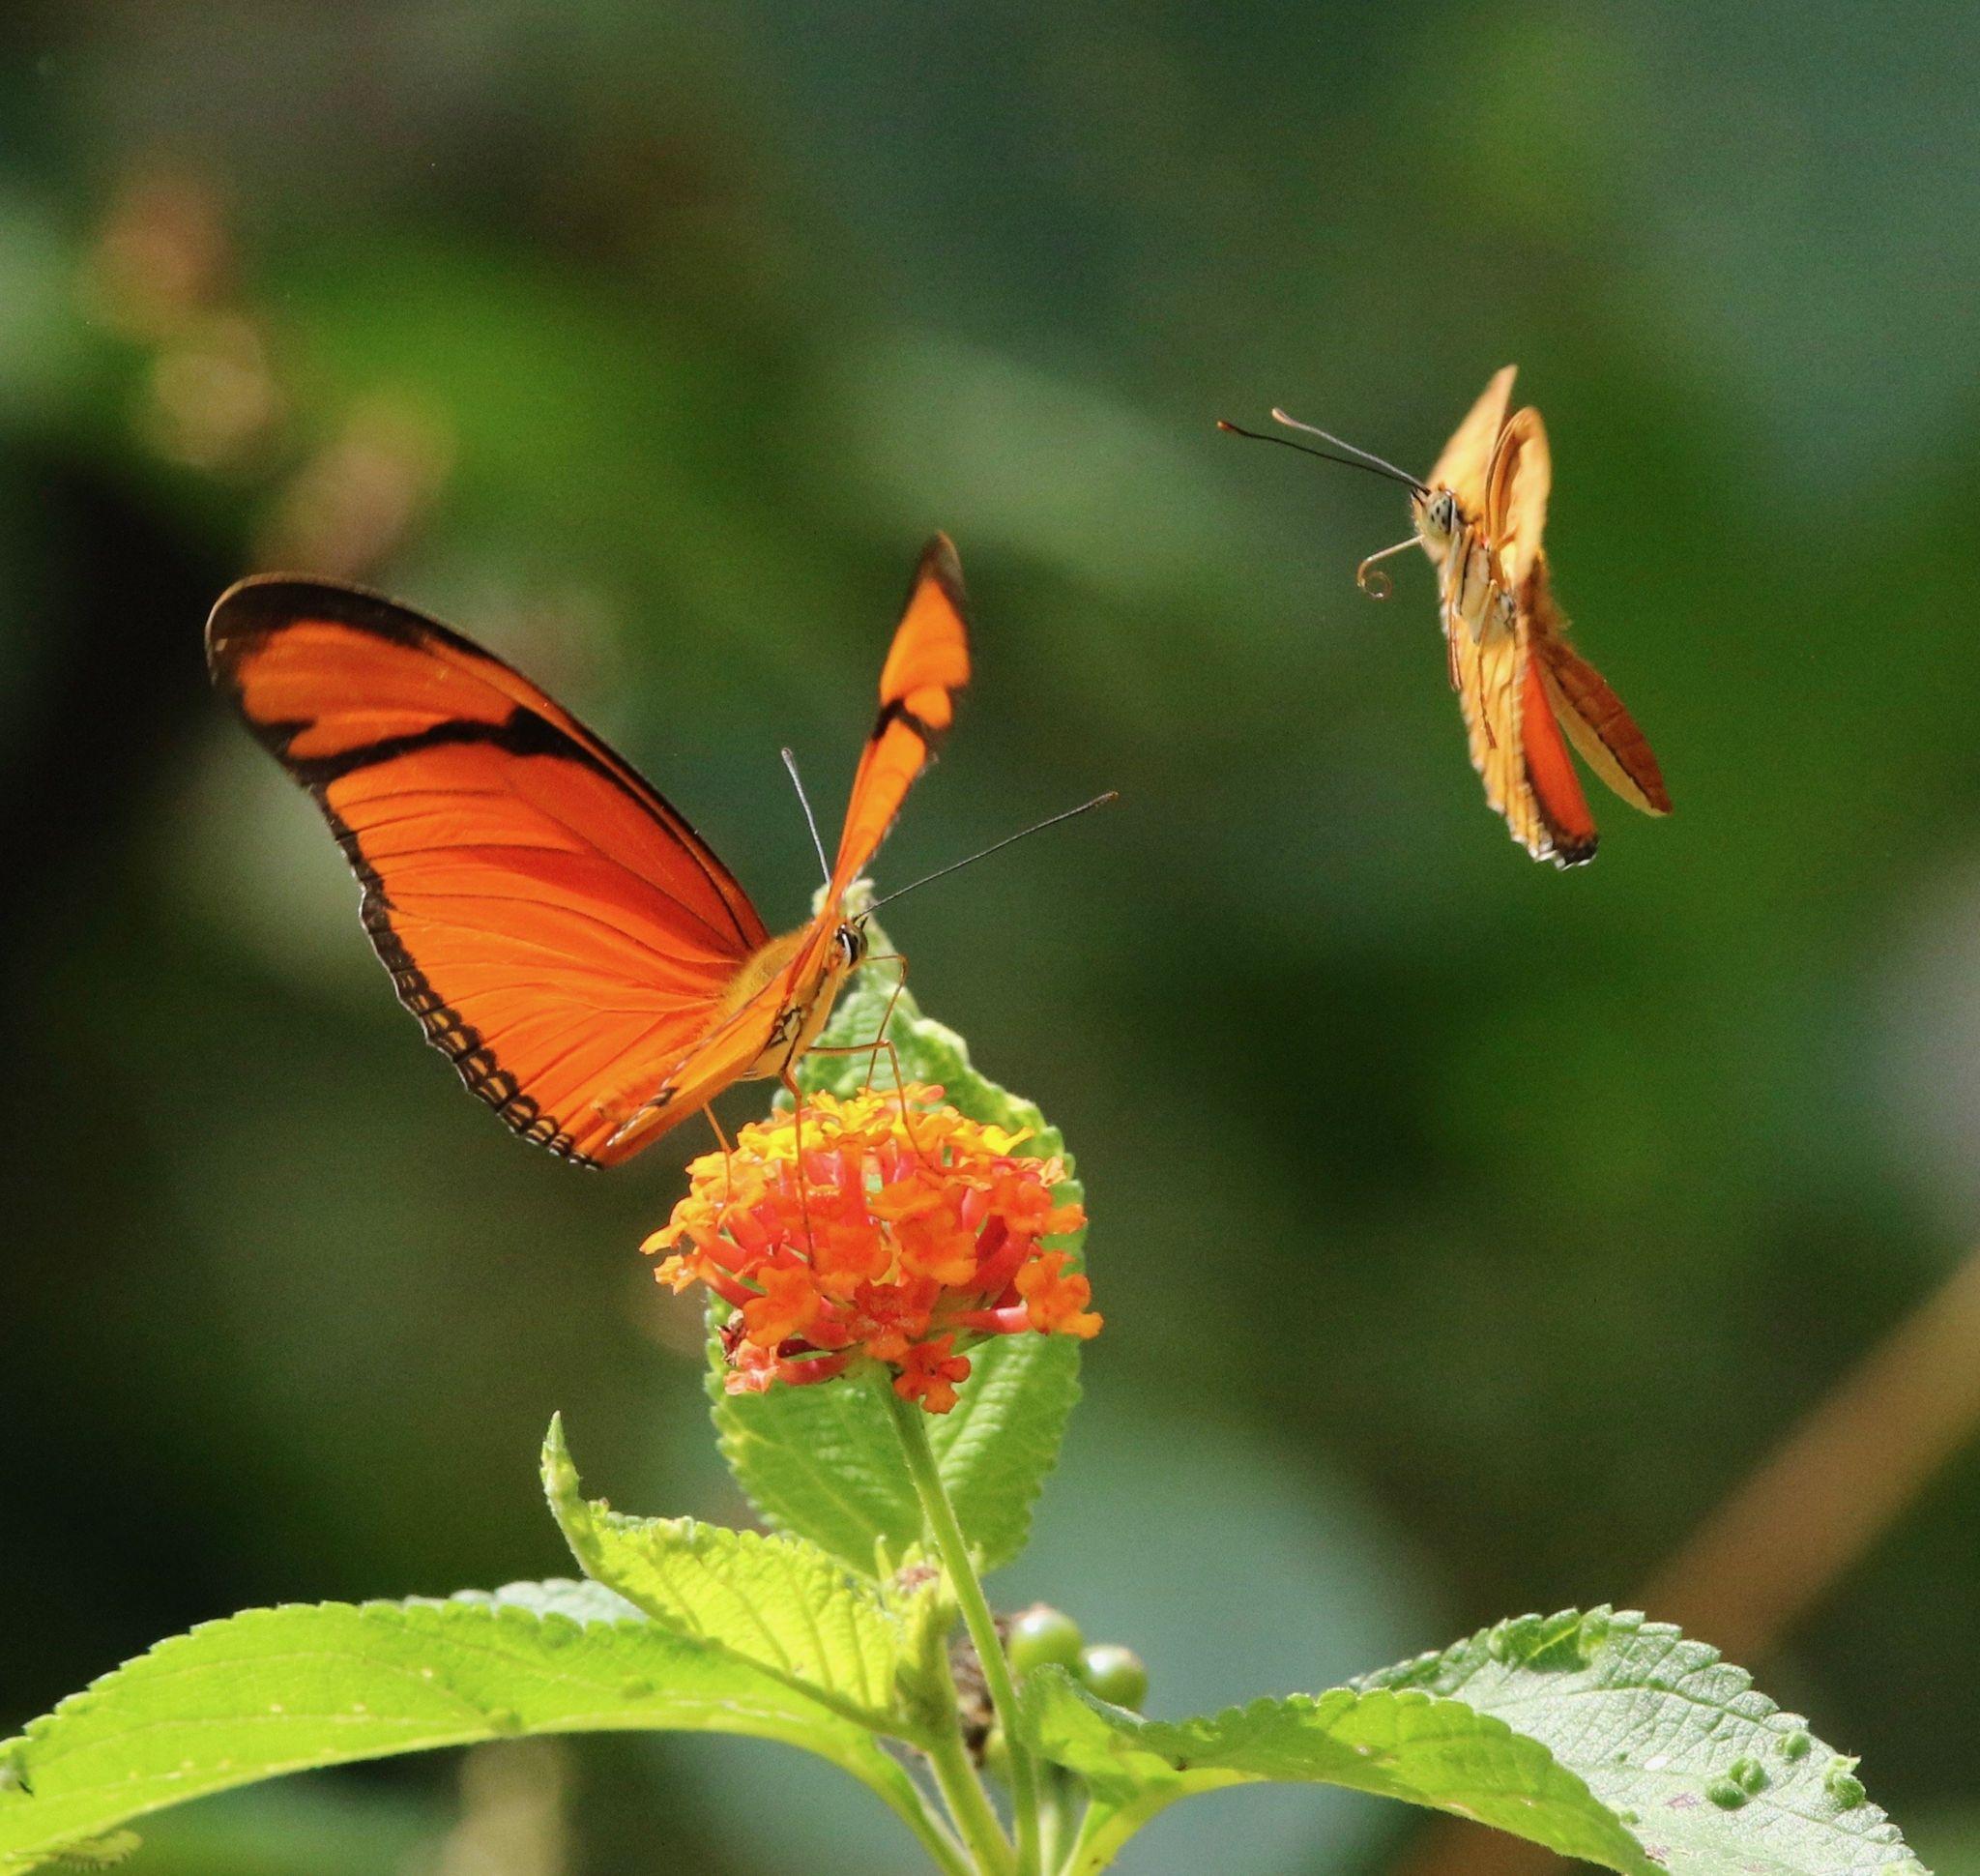 Julia heliconian butterflies, Dryas iulia, feeding on nectar